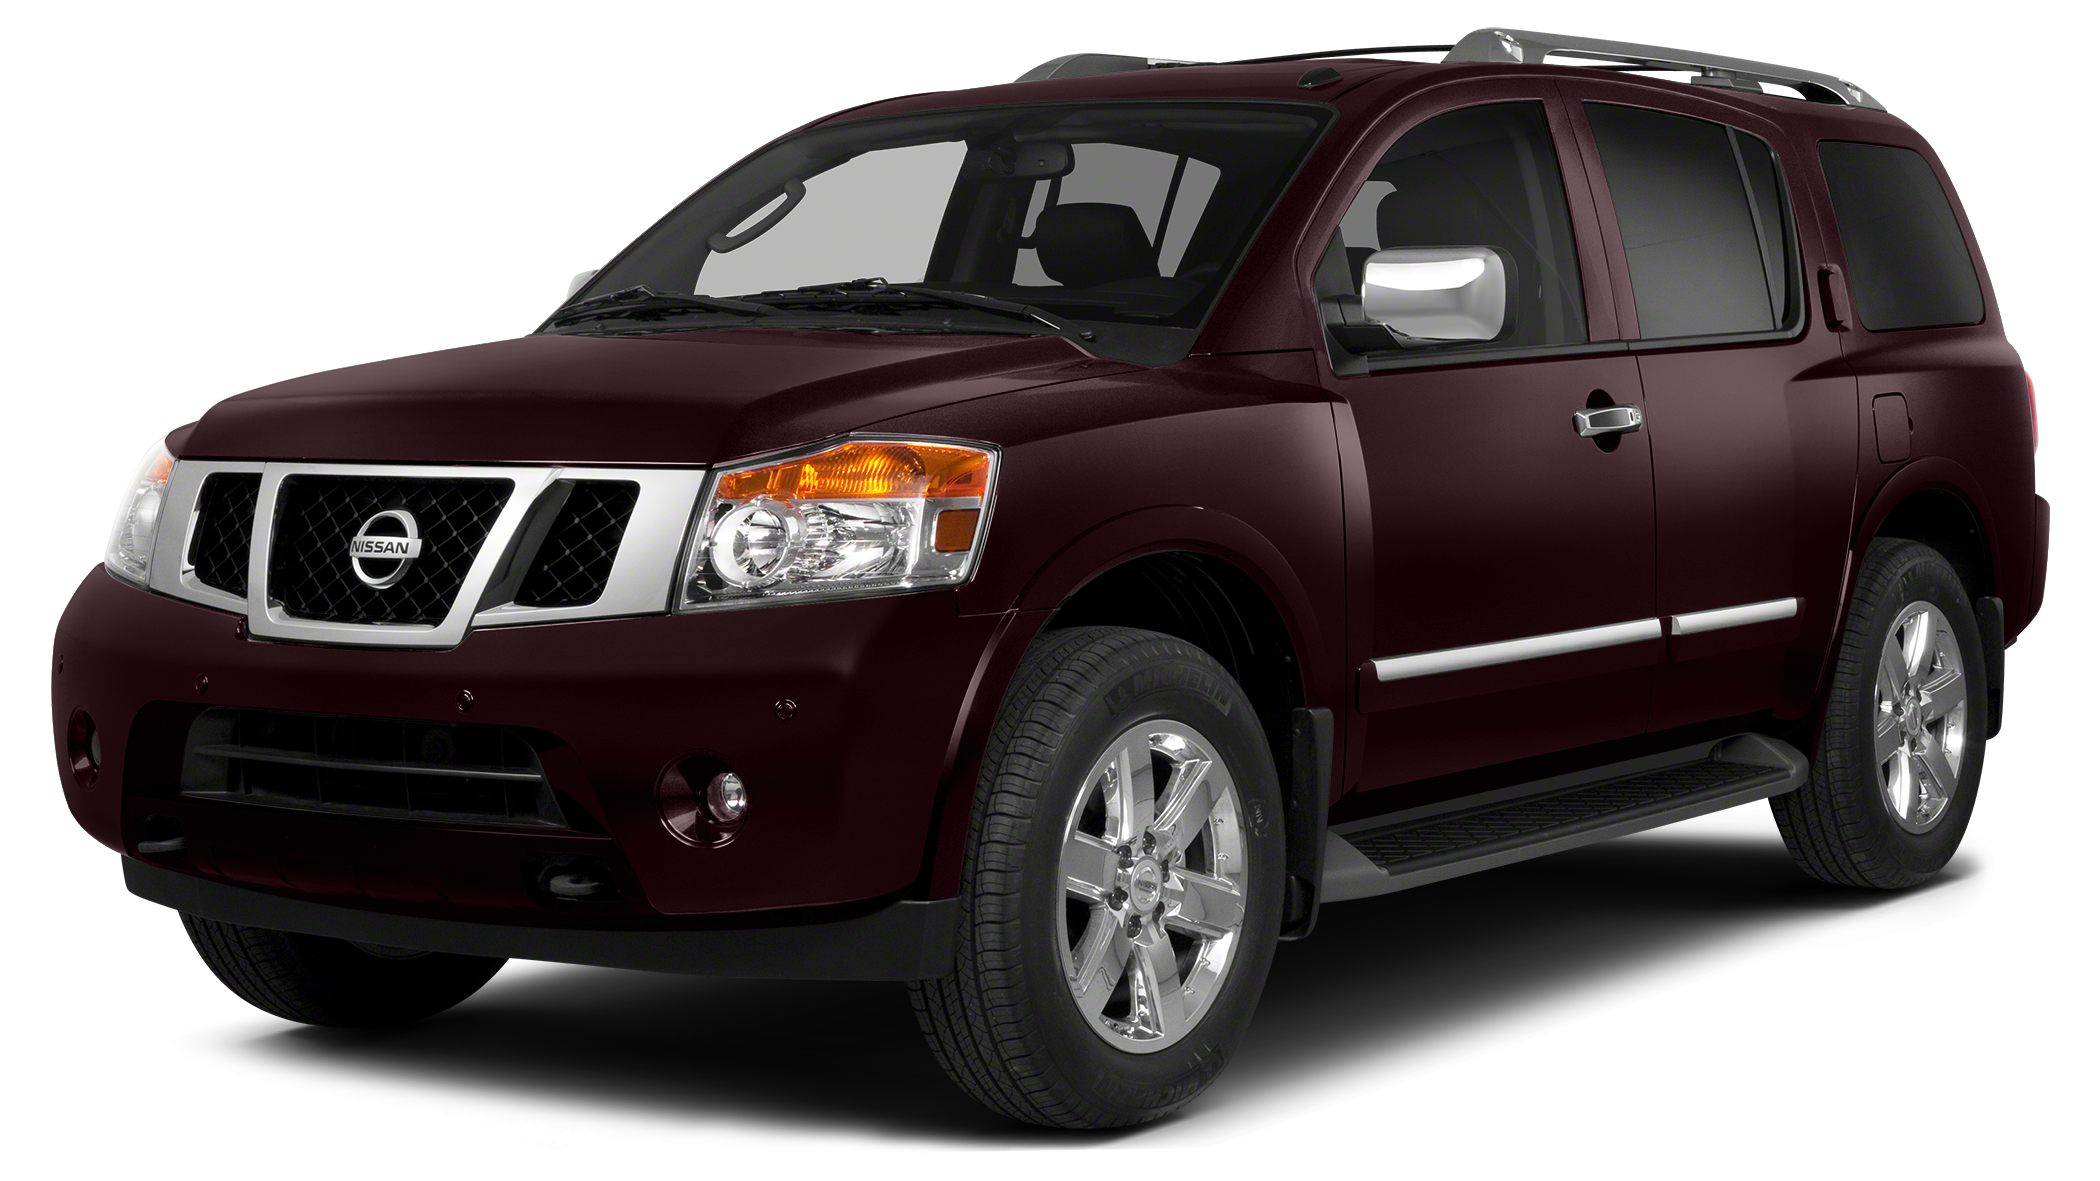 2014 Nissan Armada SV Miles 12018Color Midnight Garnet Stock 16MU88A VIN 5N1AA0NDXEN611382